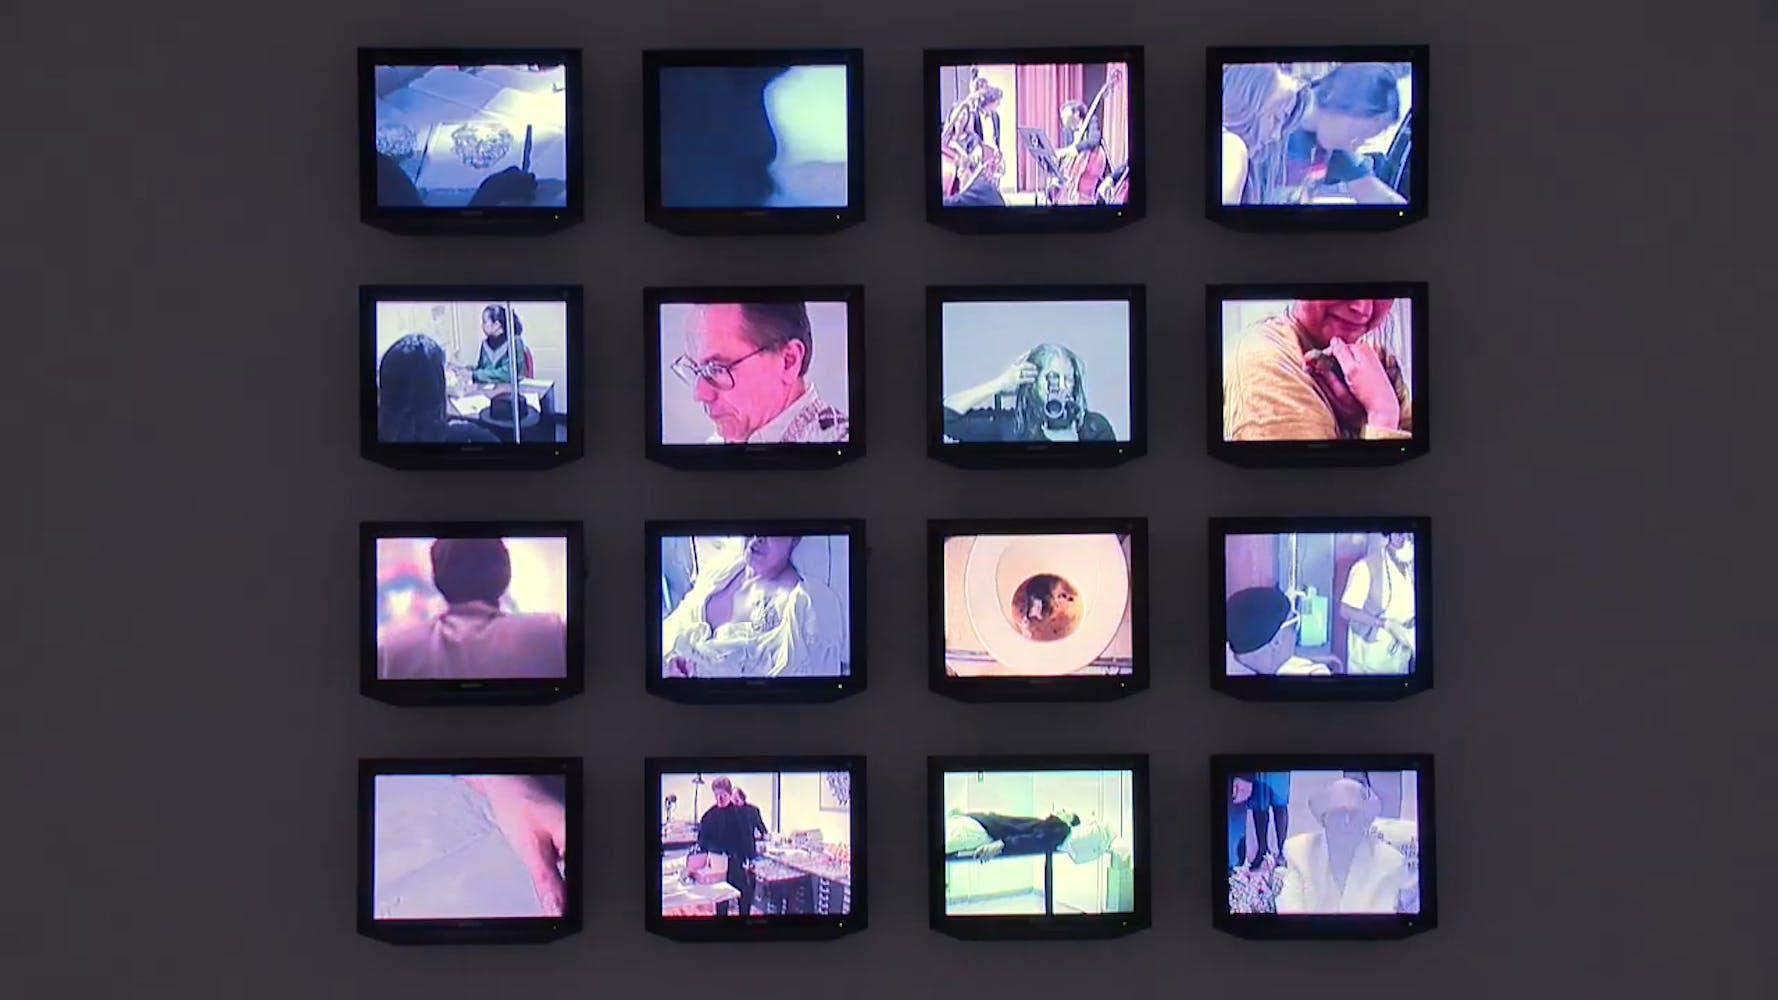 Peter Eleey discusses Hannah Wilke's The Intra-Venus Tapes